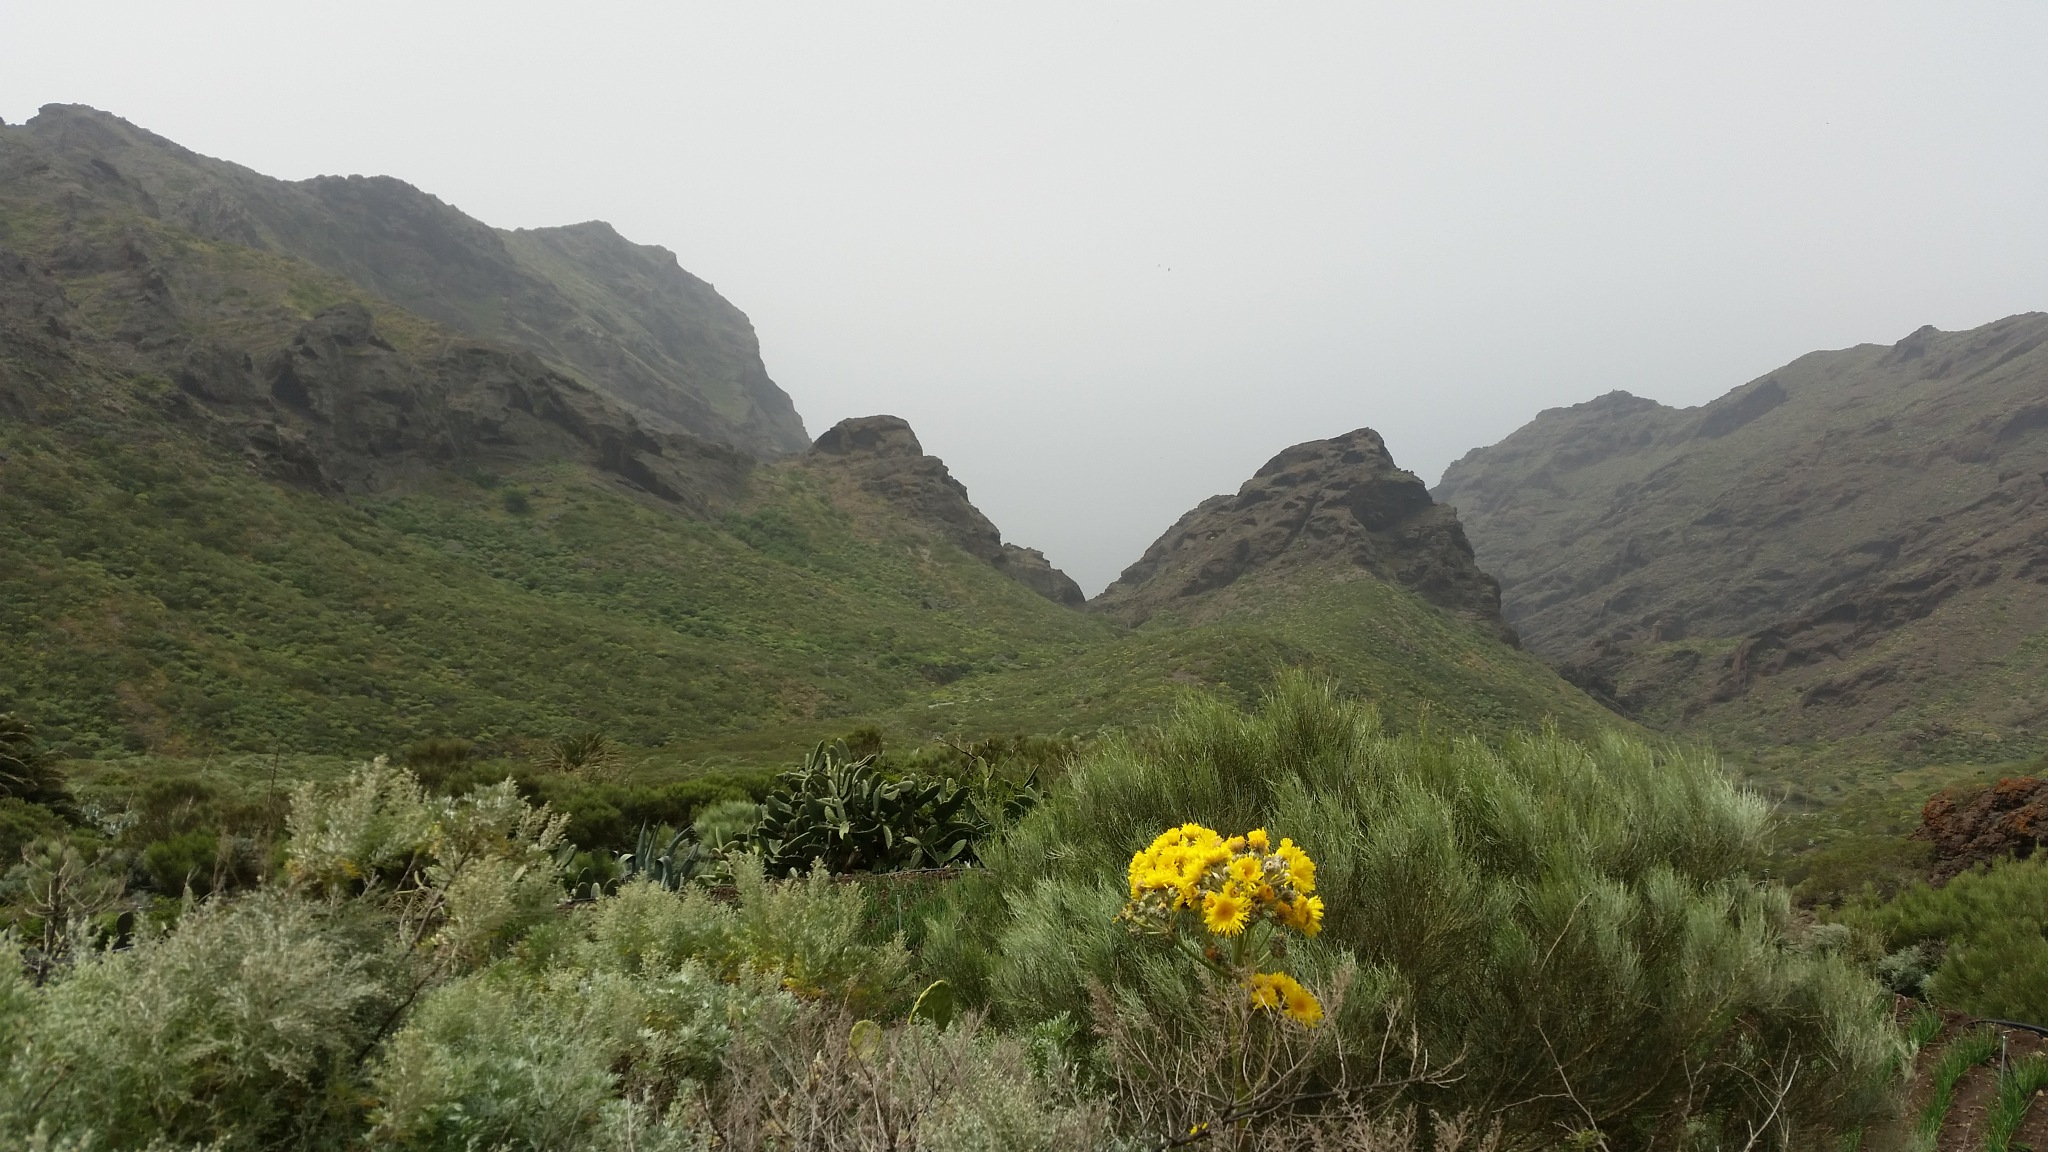 Tenerife  by Jitske Knol